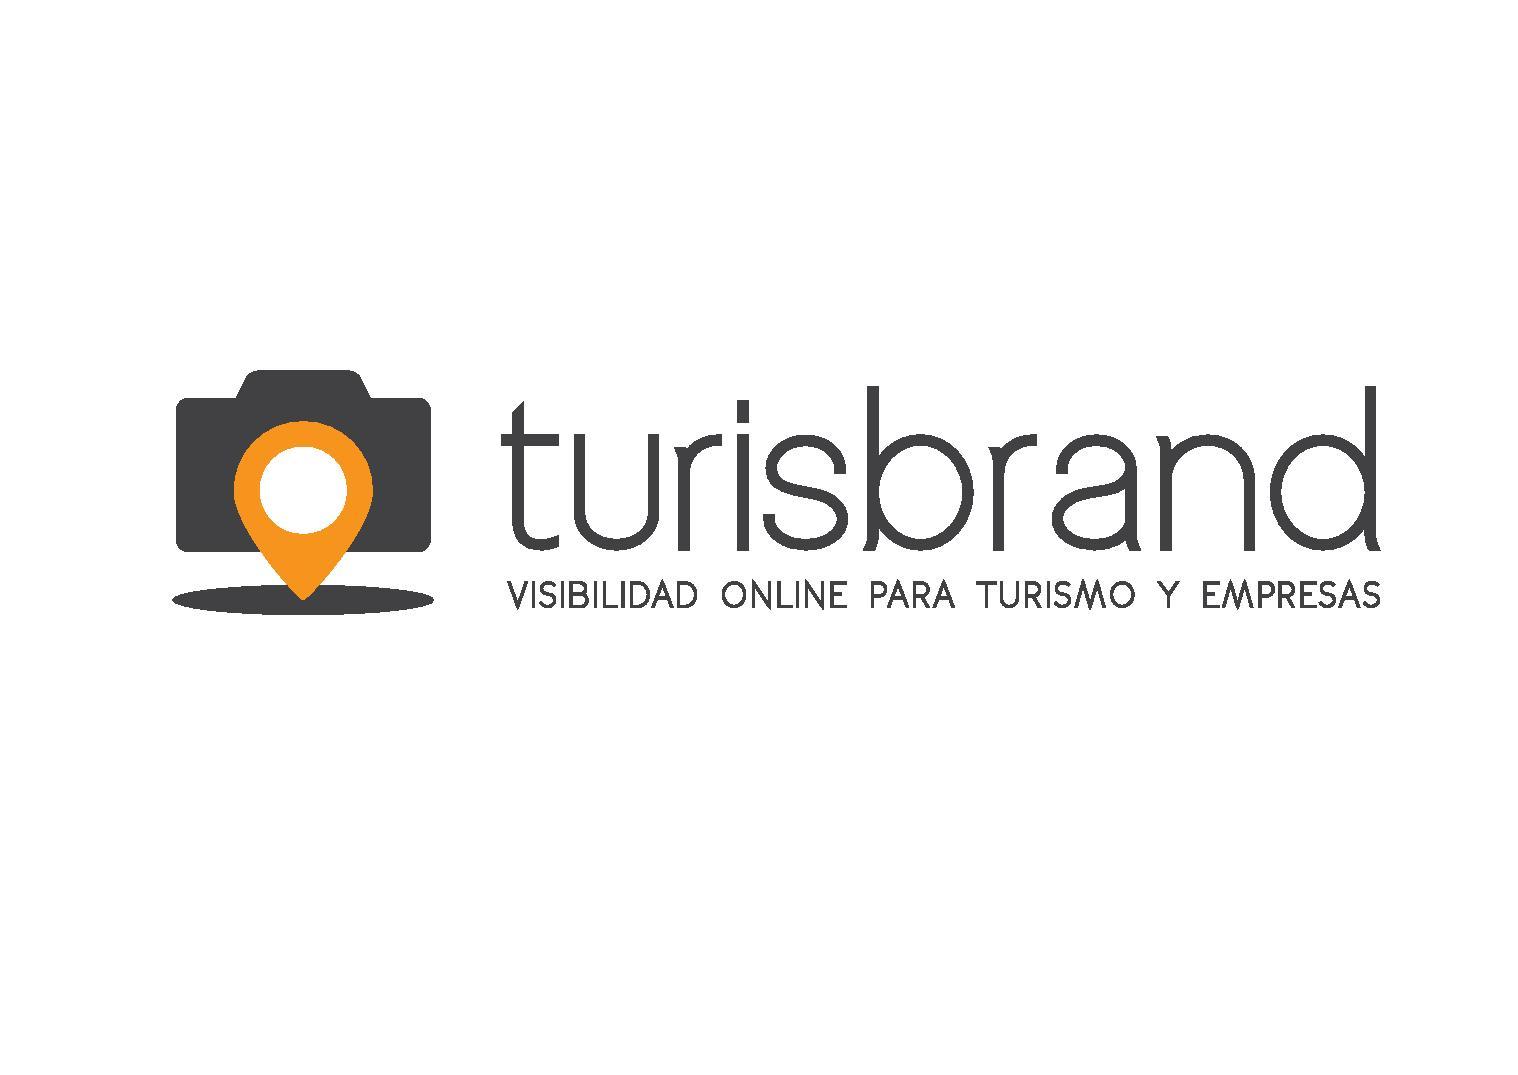 LOGO-TURISBRAND-page-001